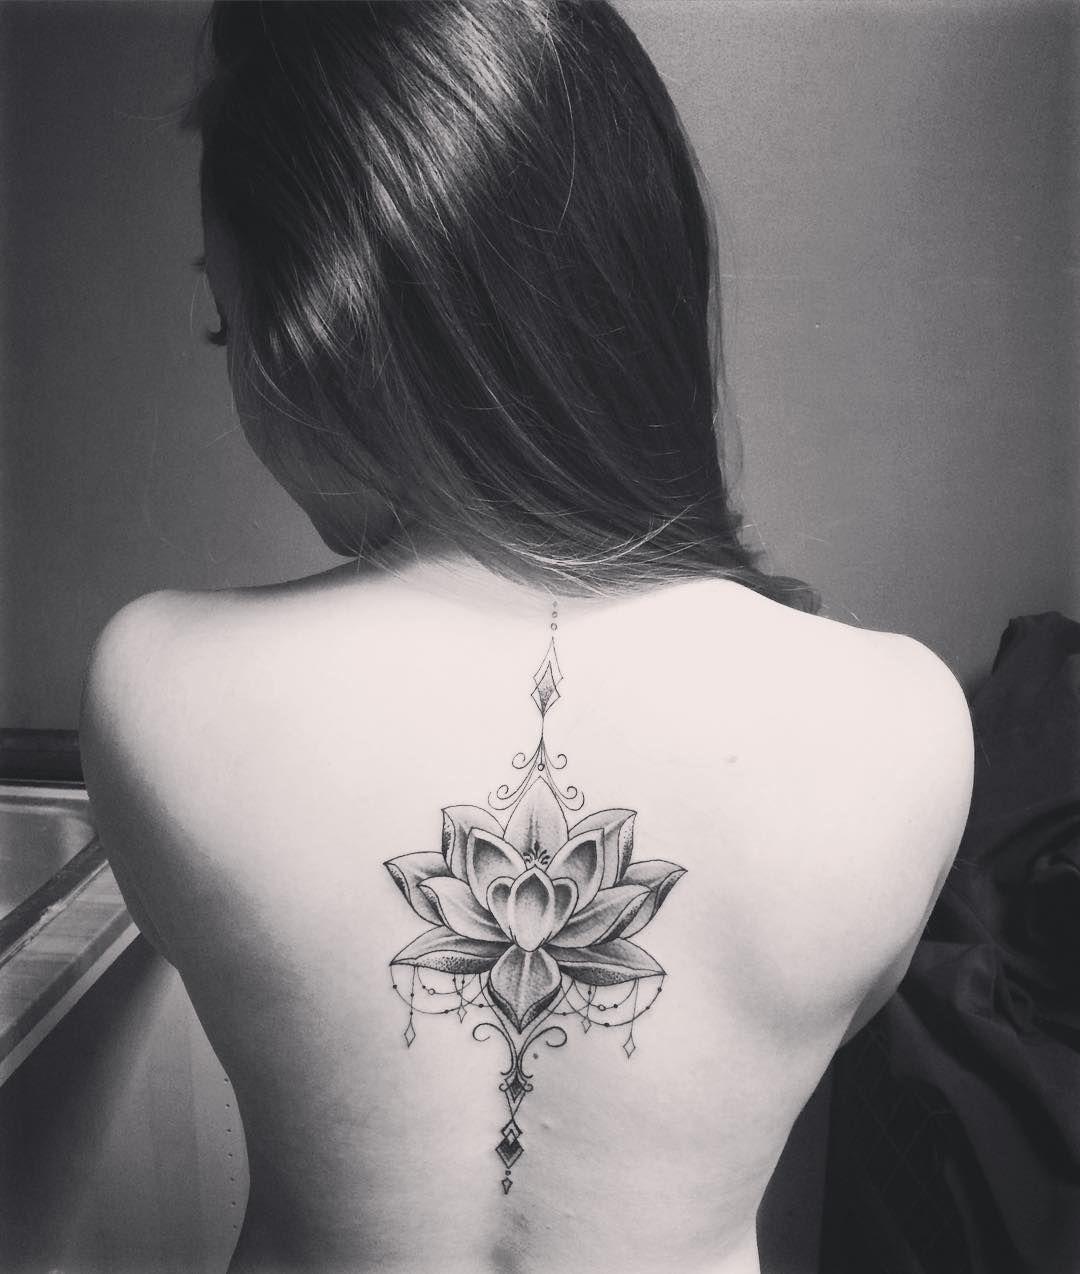 Image Result For Spine Tattoo Tattoos Orientalmehndihenna